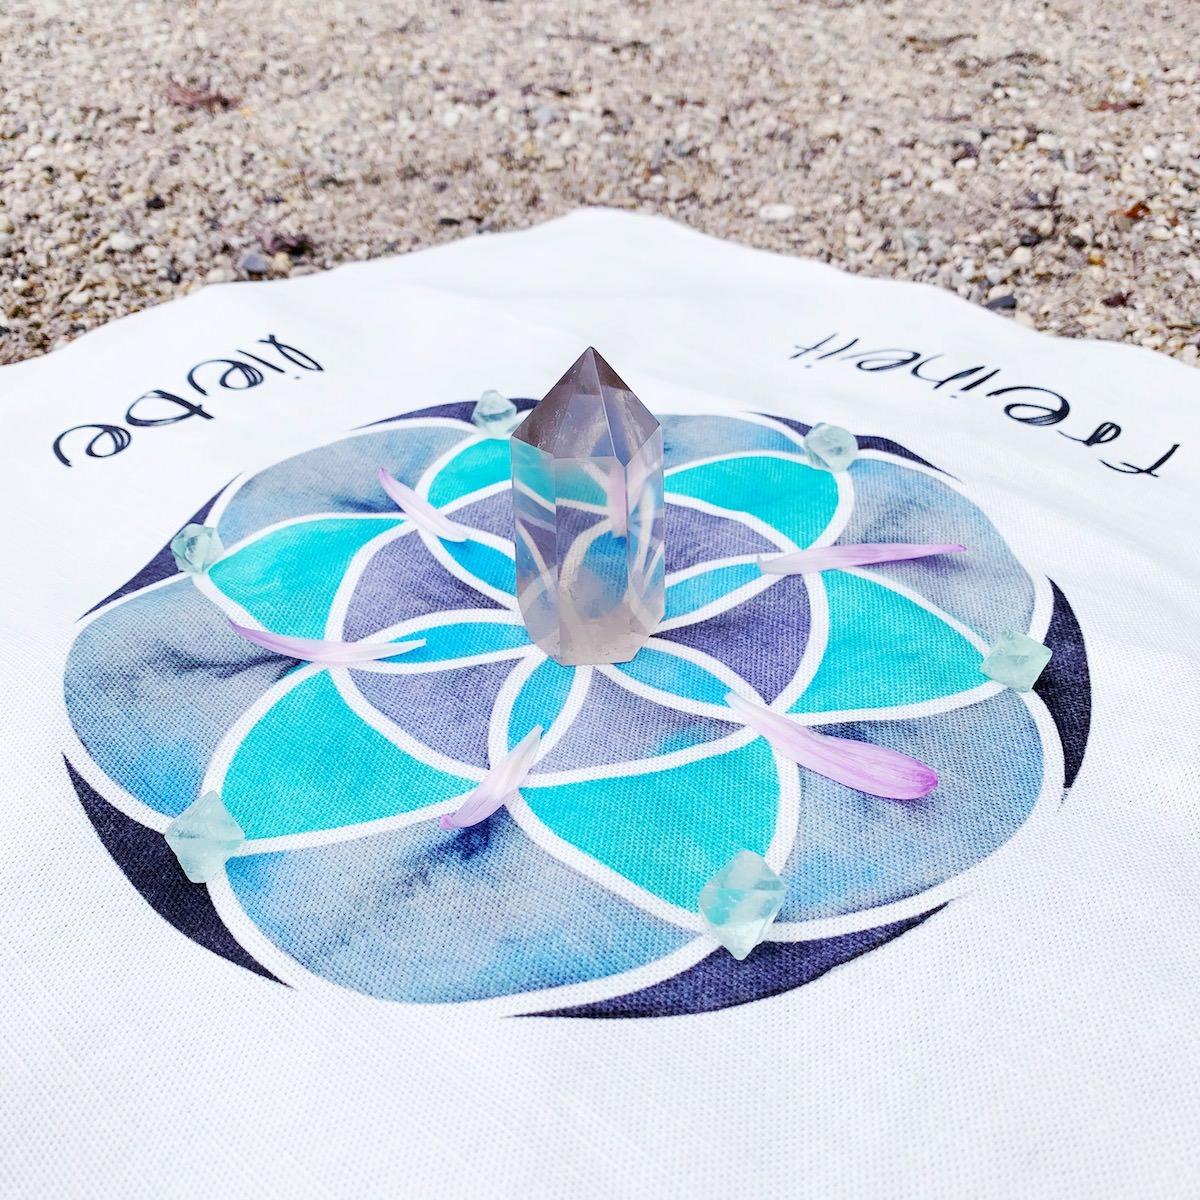 Cosmic Grids Ritualtücher